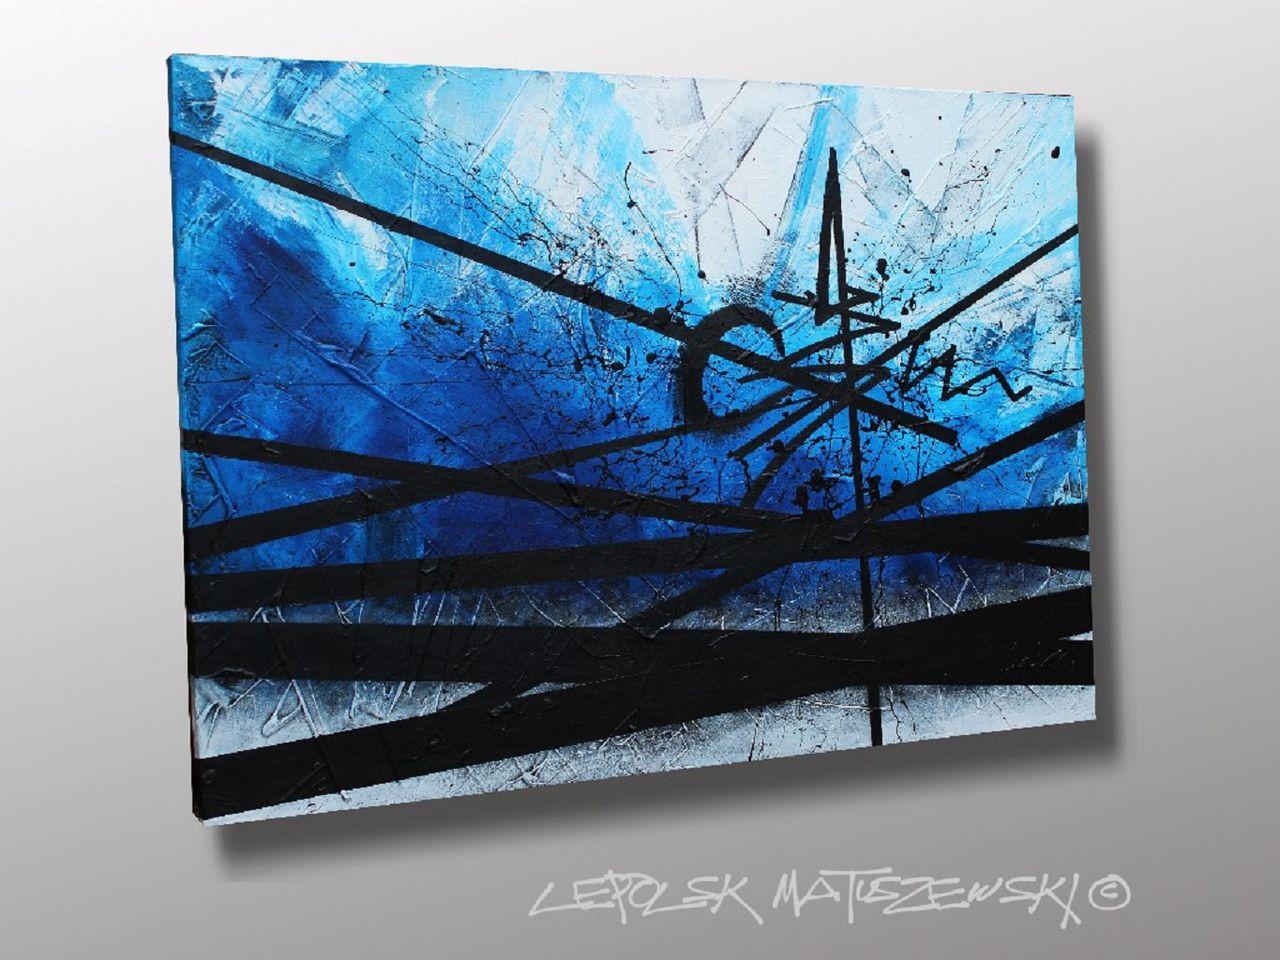 MISTER K  (Lepolsk Matuszewski)  FRACKTAL  Lepolsk Matuszewski expressionnisme abstrait contemporain